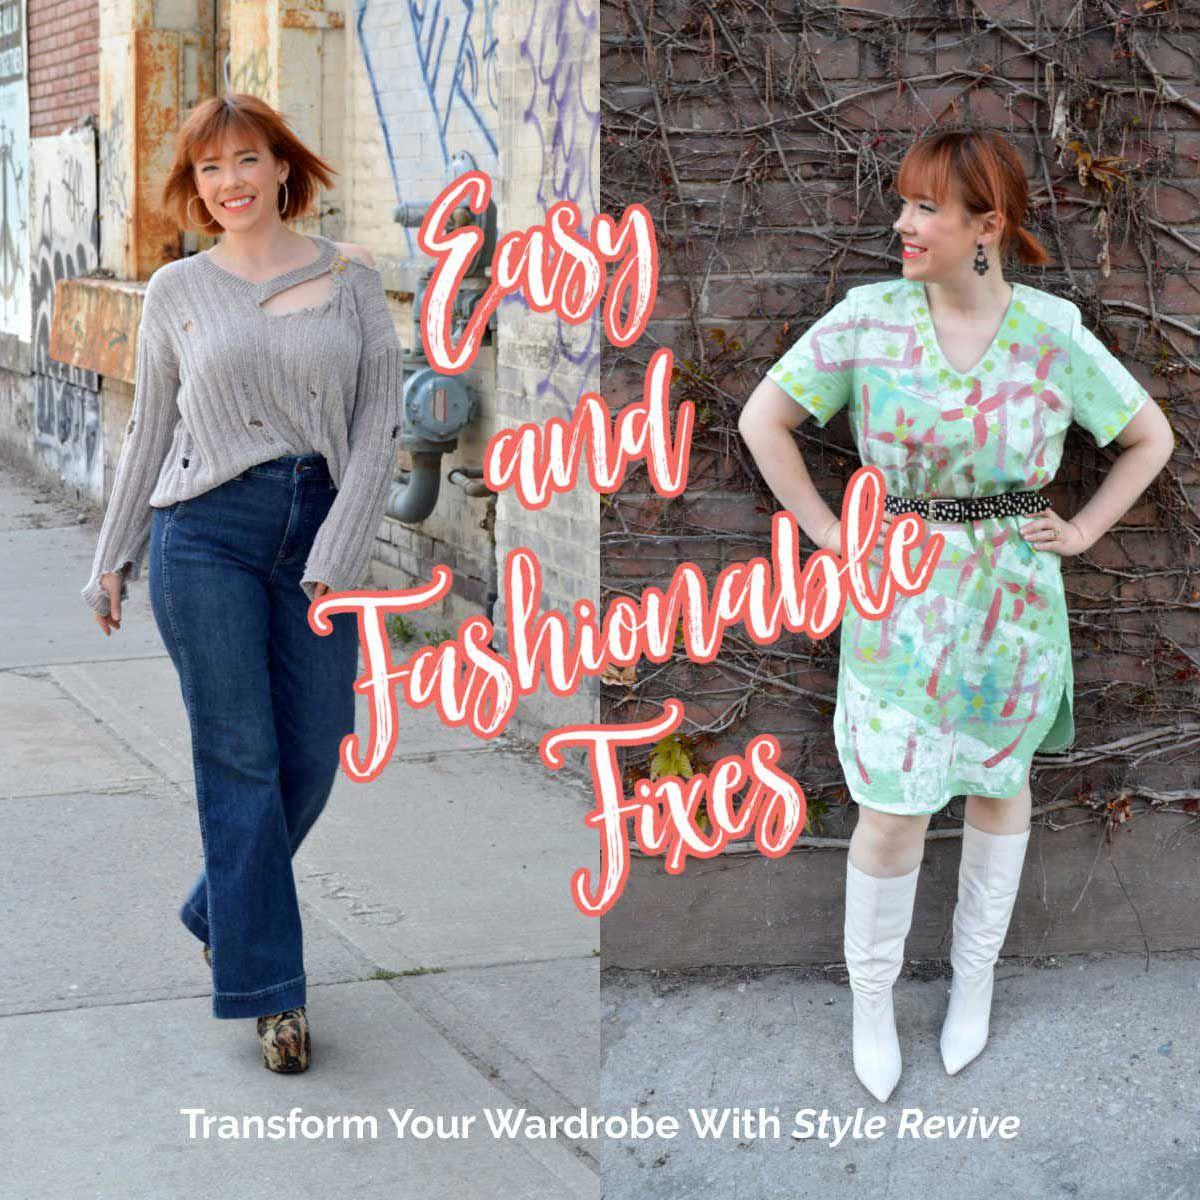 Style Revive Season 1 - Episode 4 Easy and Fashionable Fixes